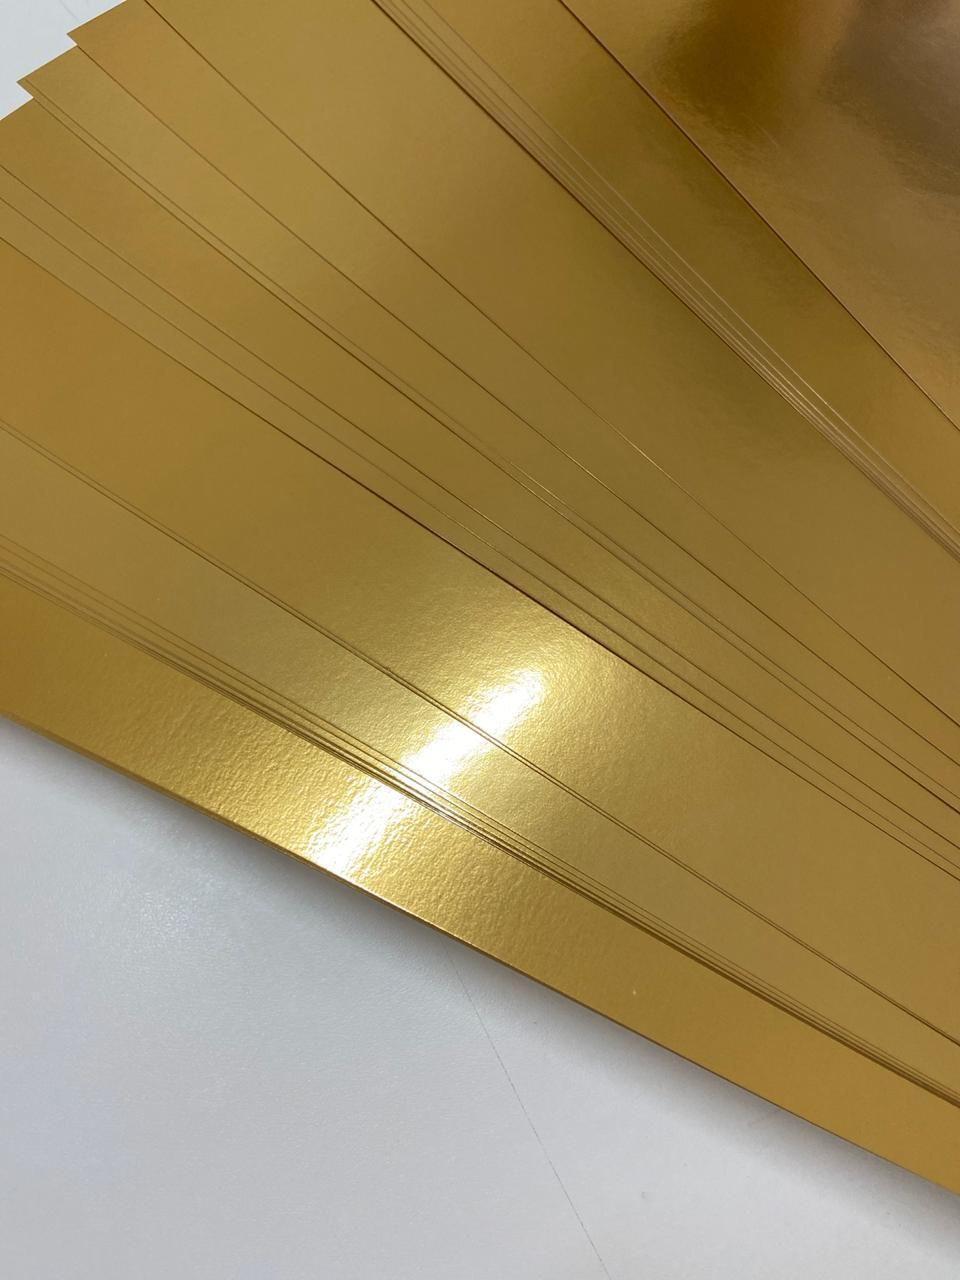 Papel Canson Laminada Dourada 25x32cm 280g/m2 Lamicote